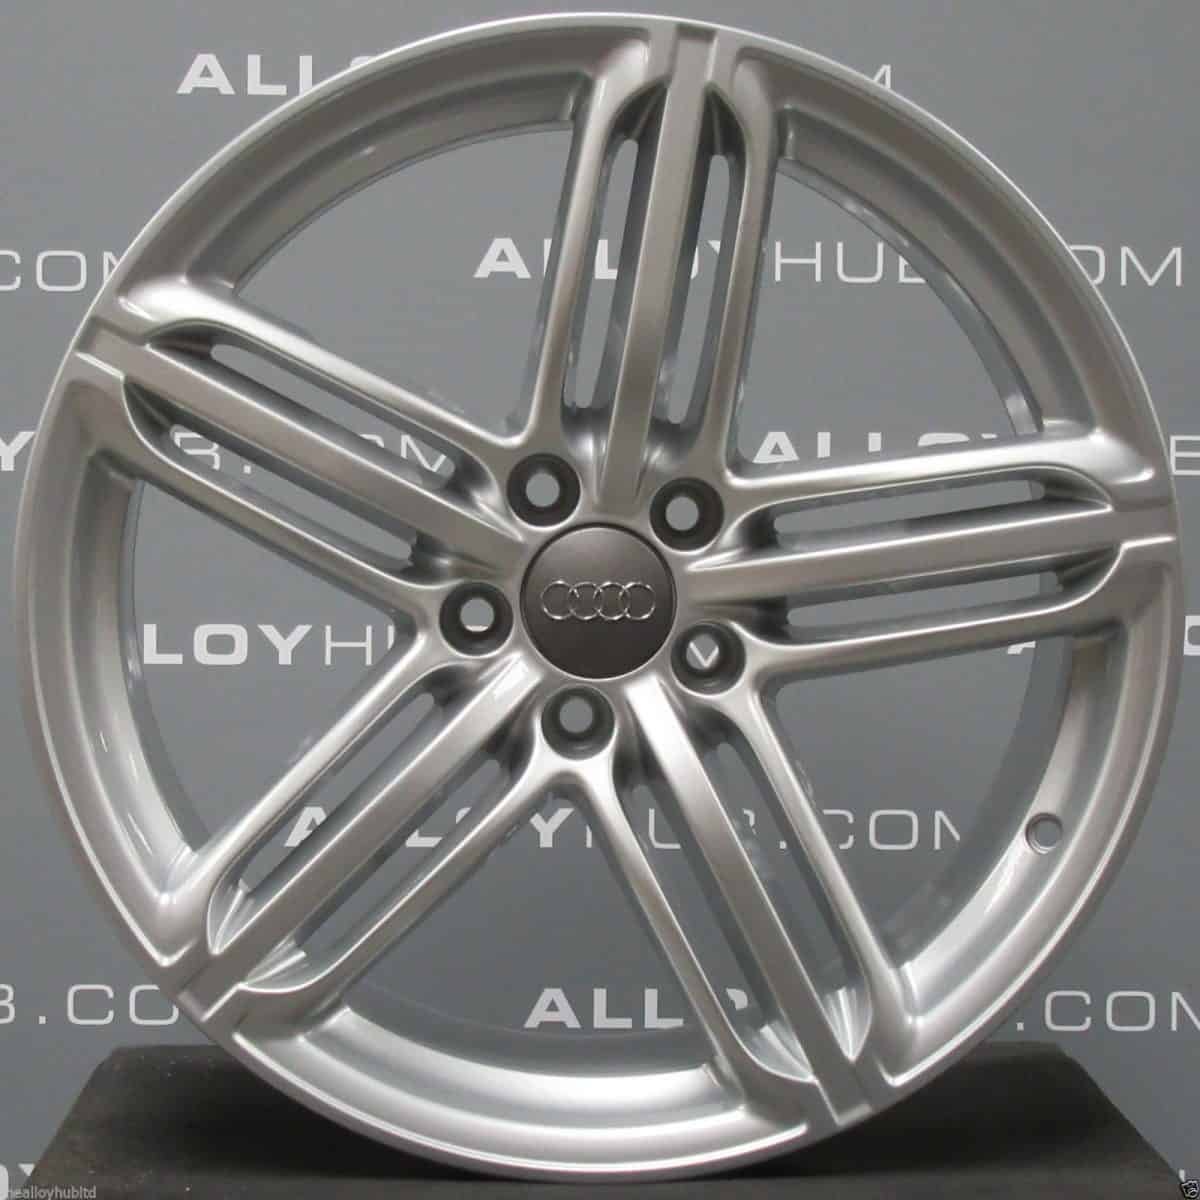 "Genuine Audi TT TTS MK2 8J 5 Segment Spoke 19"" Inch Alloy Wheels with Silver Finish 8J0 601 025 CM"